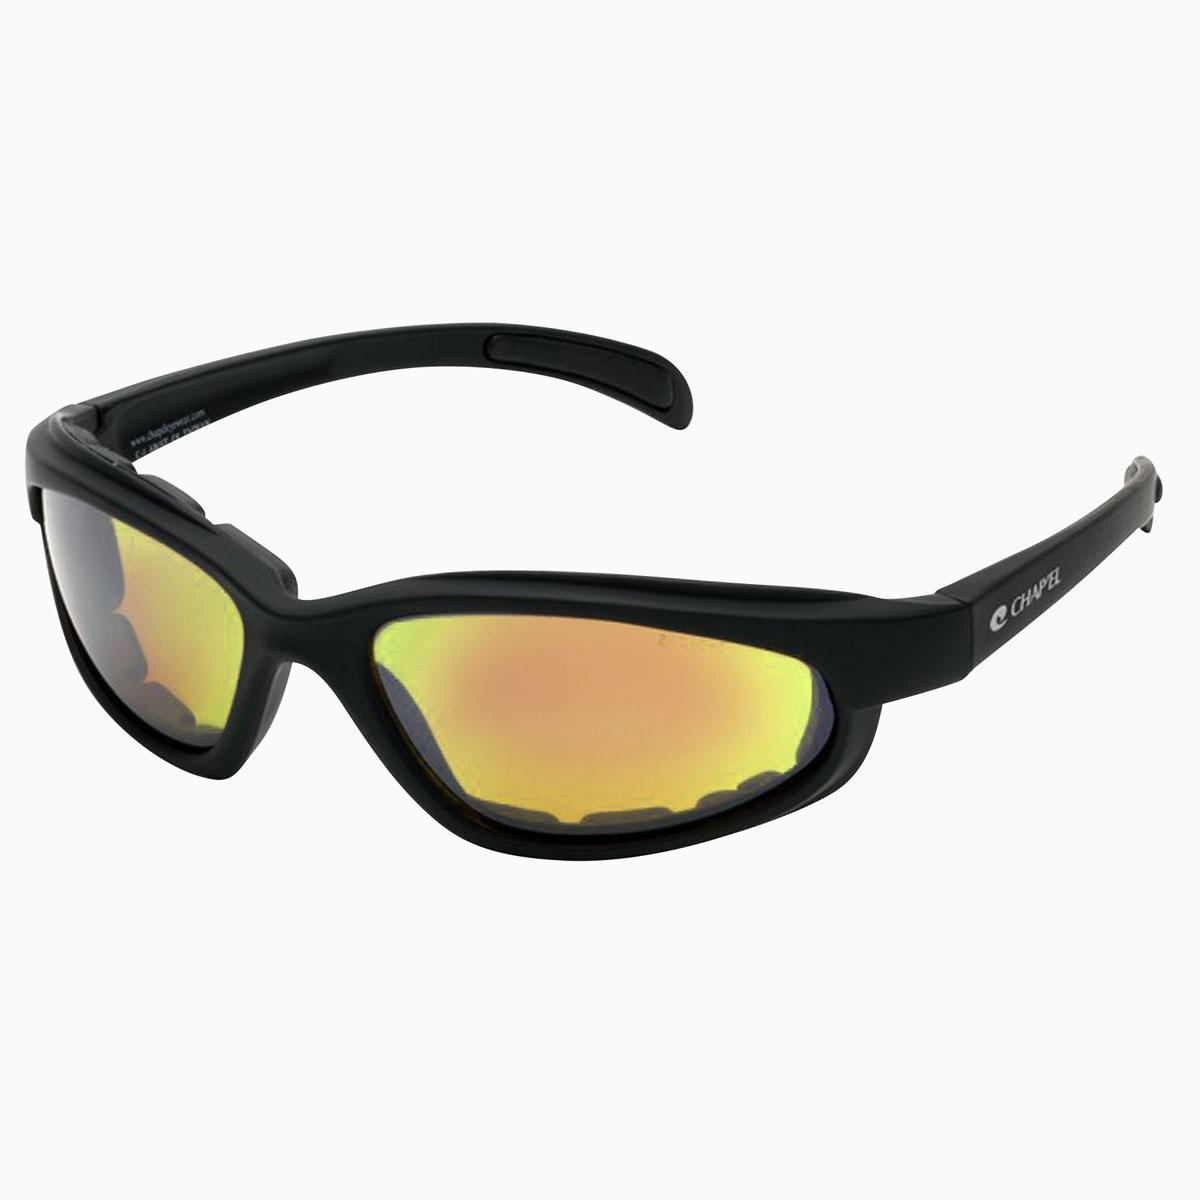 Chap'el C-1 Black Frame/Red RV Lens Padded Sunglasses